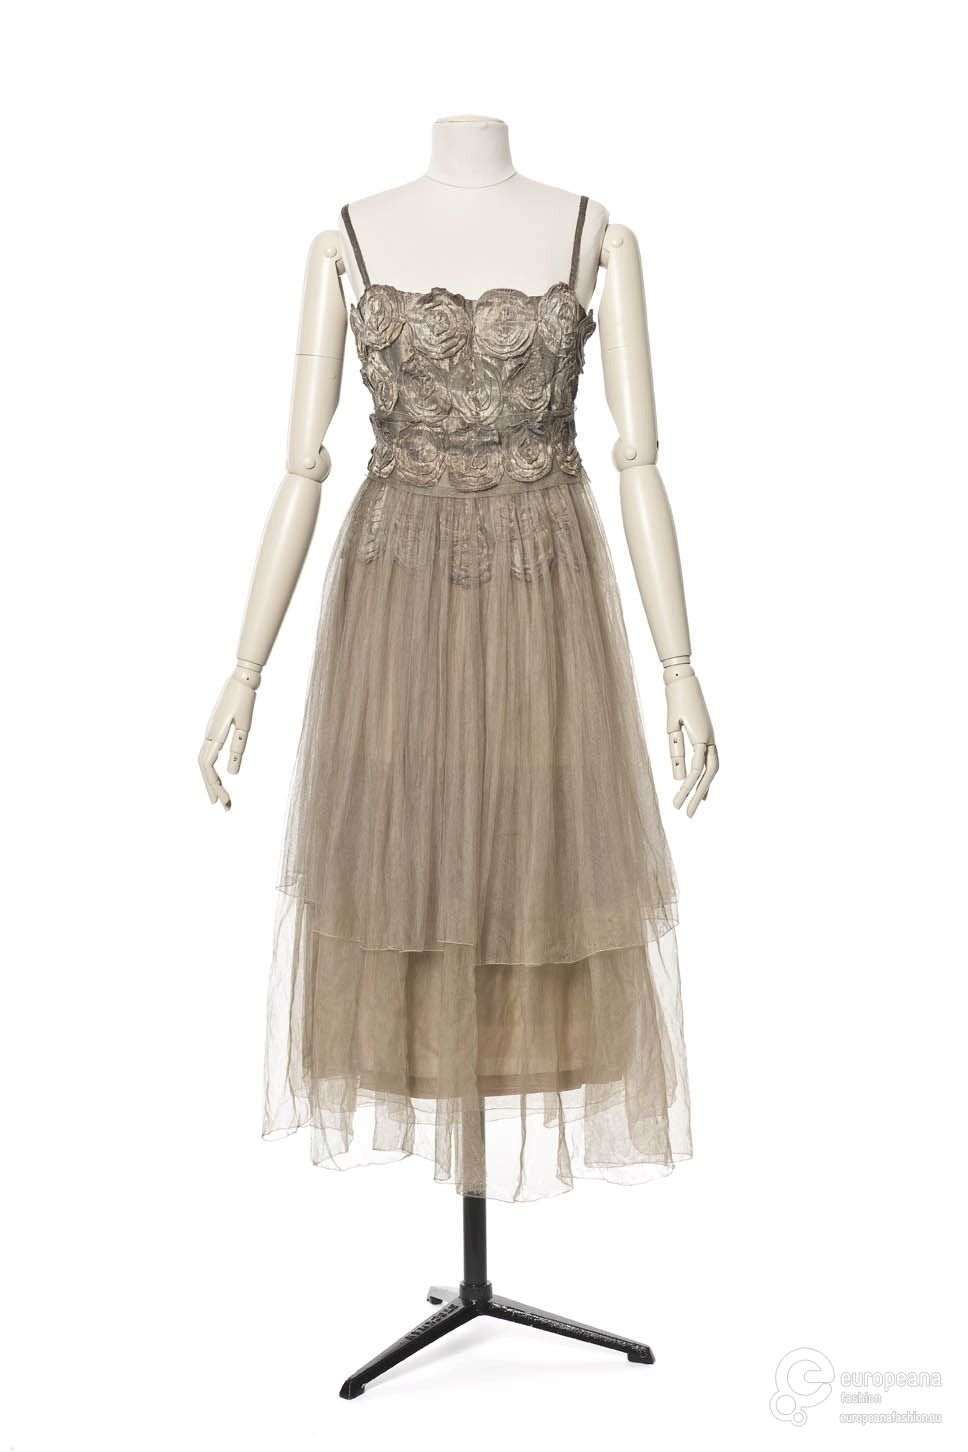 Vionnet evening dress from les arts décoratifs via europeana